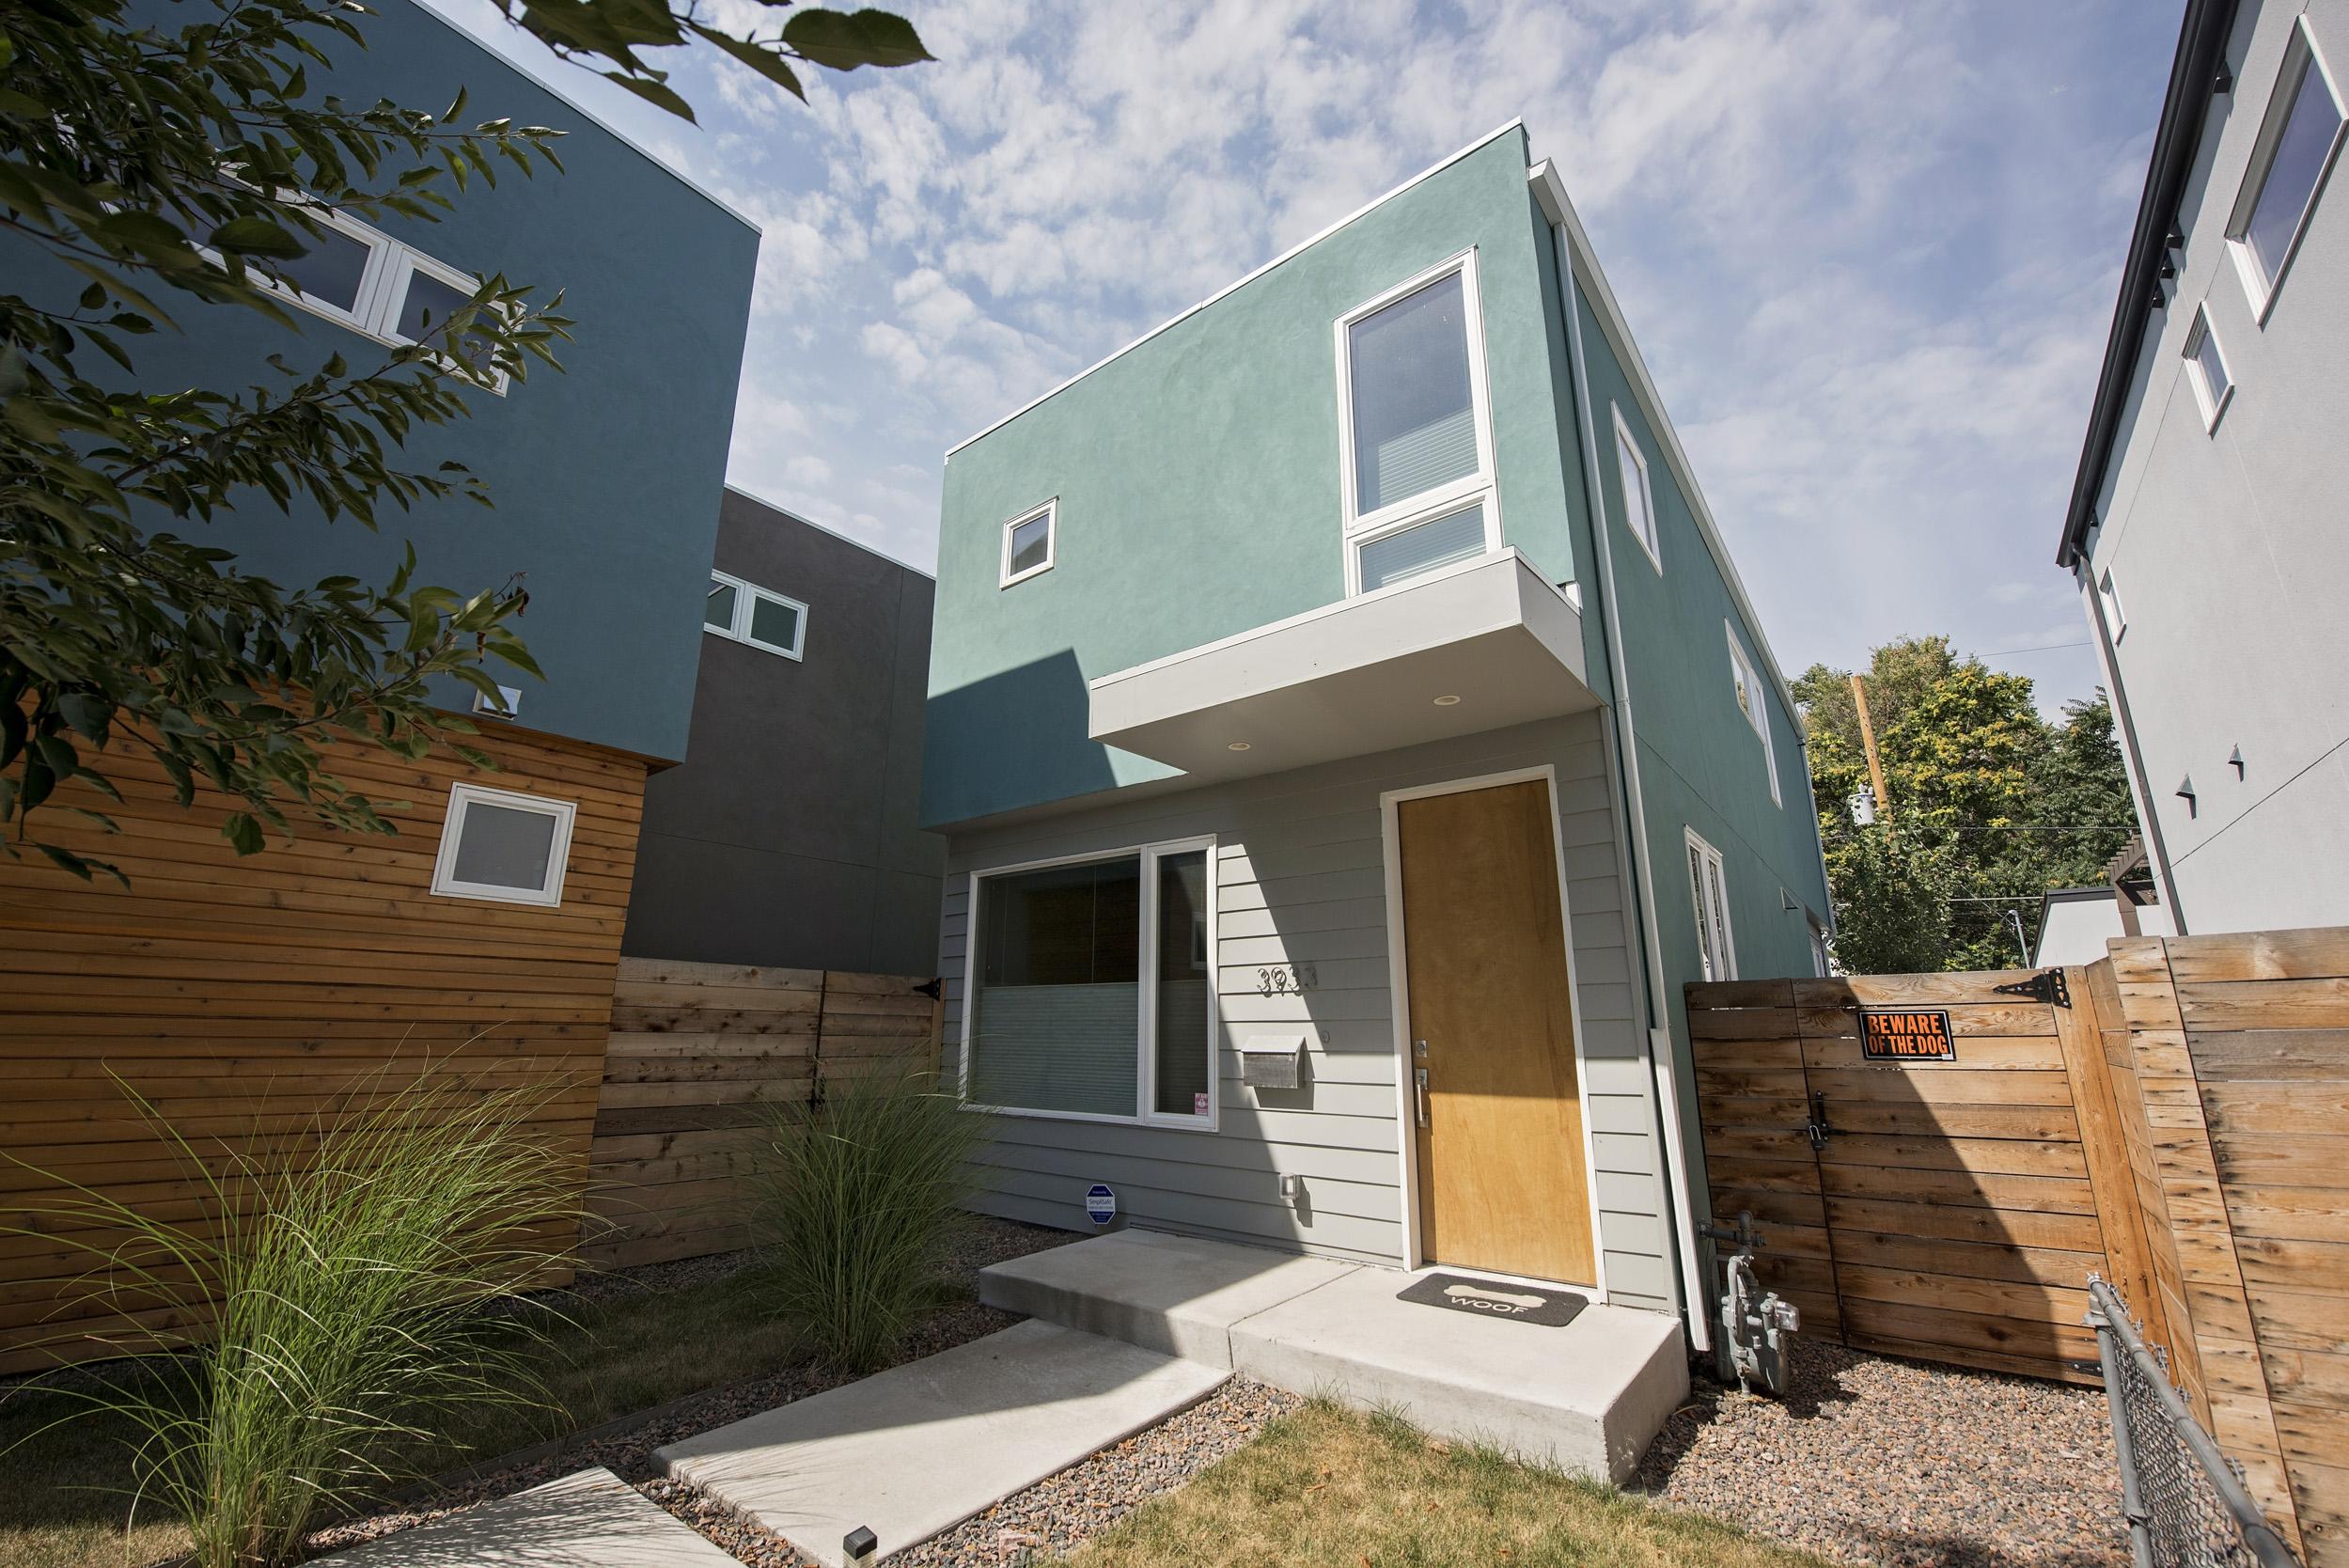 Britt_Nemeth_Photography_Real_Estate_Commercial_Architectural059.jpg